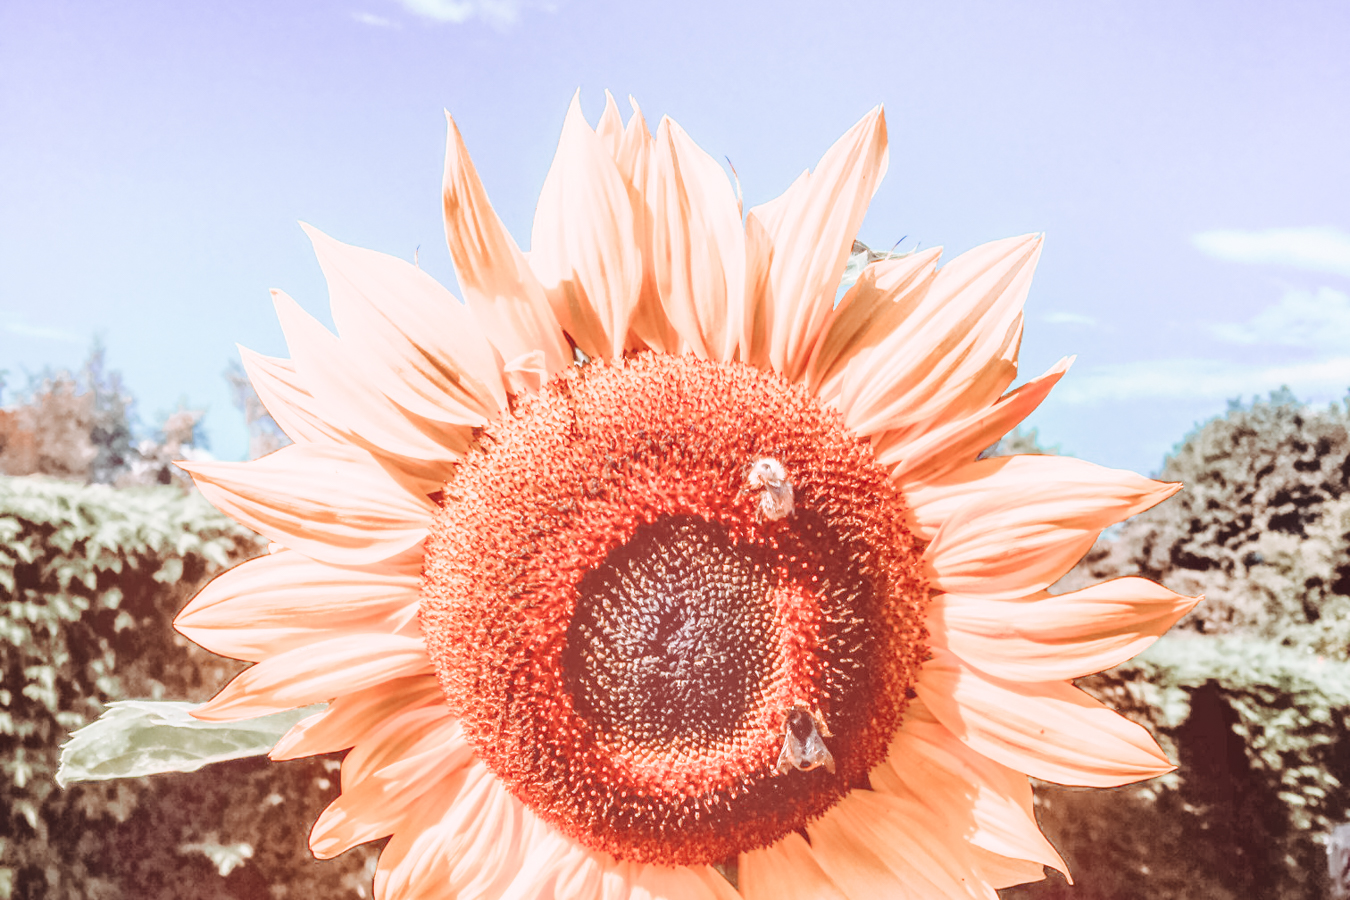 Sunflower at Royal Botanic Garden Edinburgh